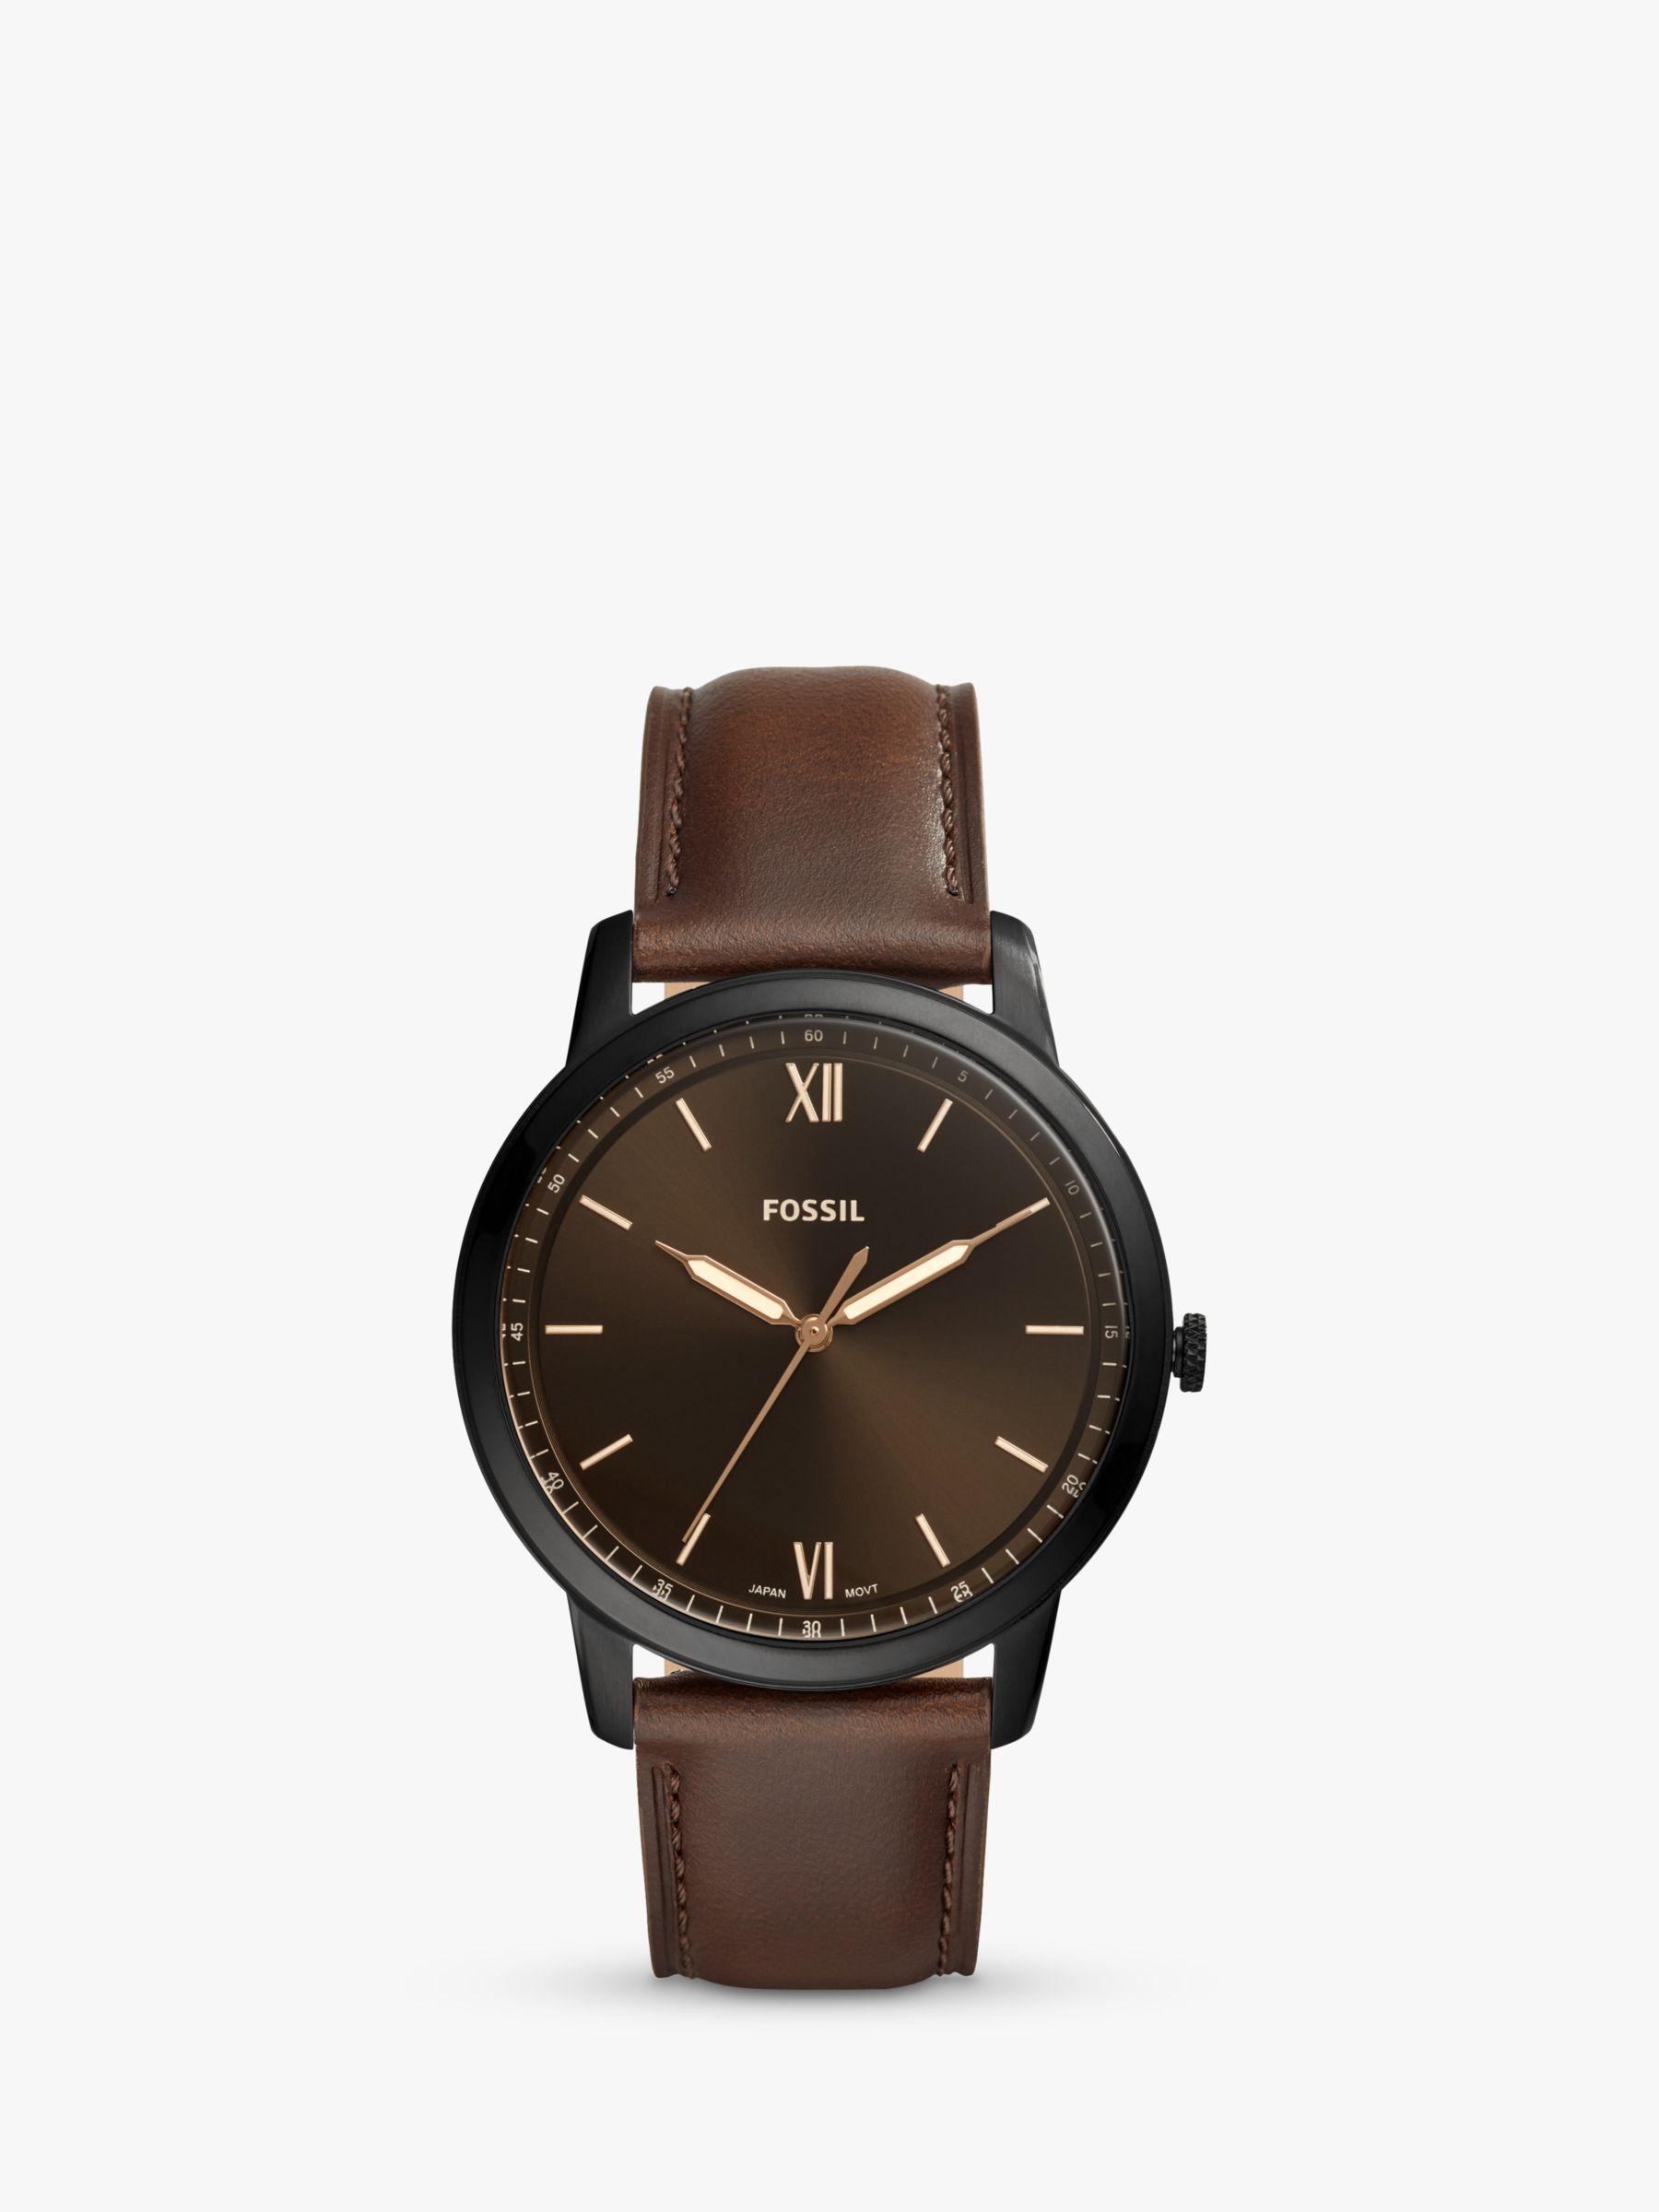 Fossil Fossil FS5551 Men's Minimalist Leather Strap Watch, Brown